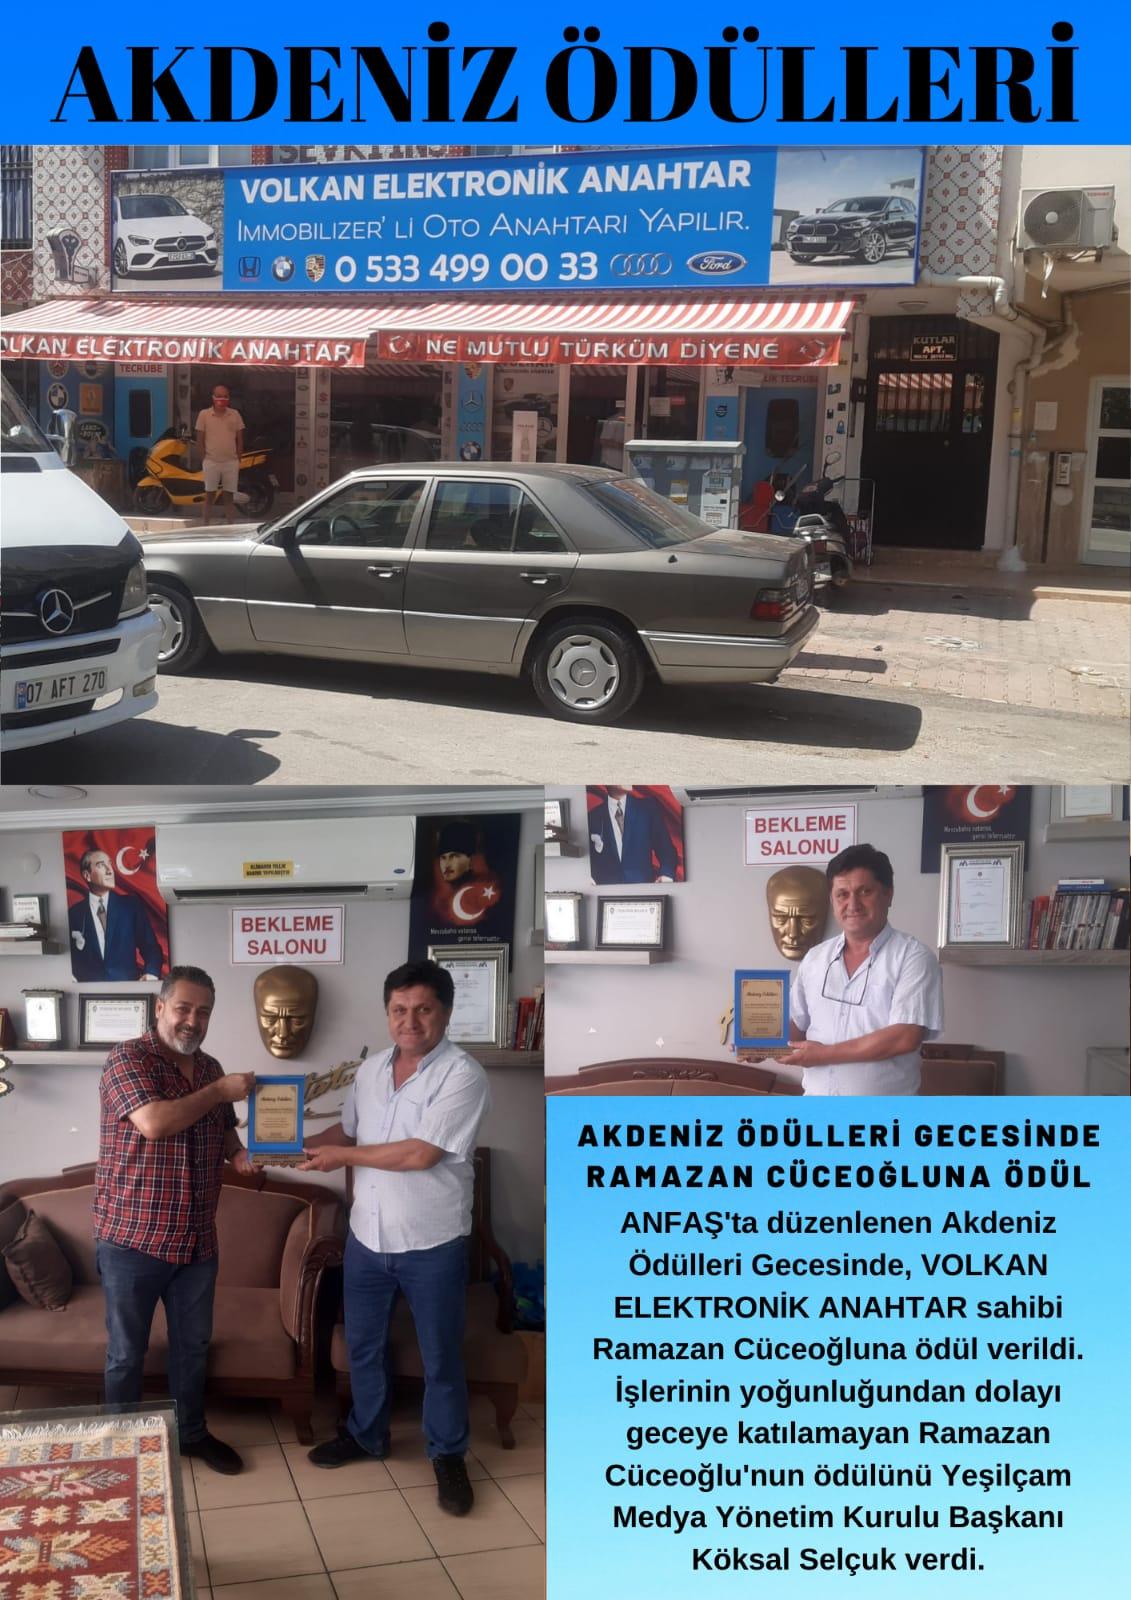 Volkan Elektronik Anahtar Ramazan Cüceoğlu'na Ödül